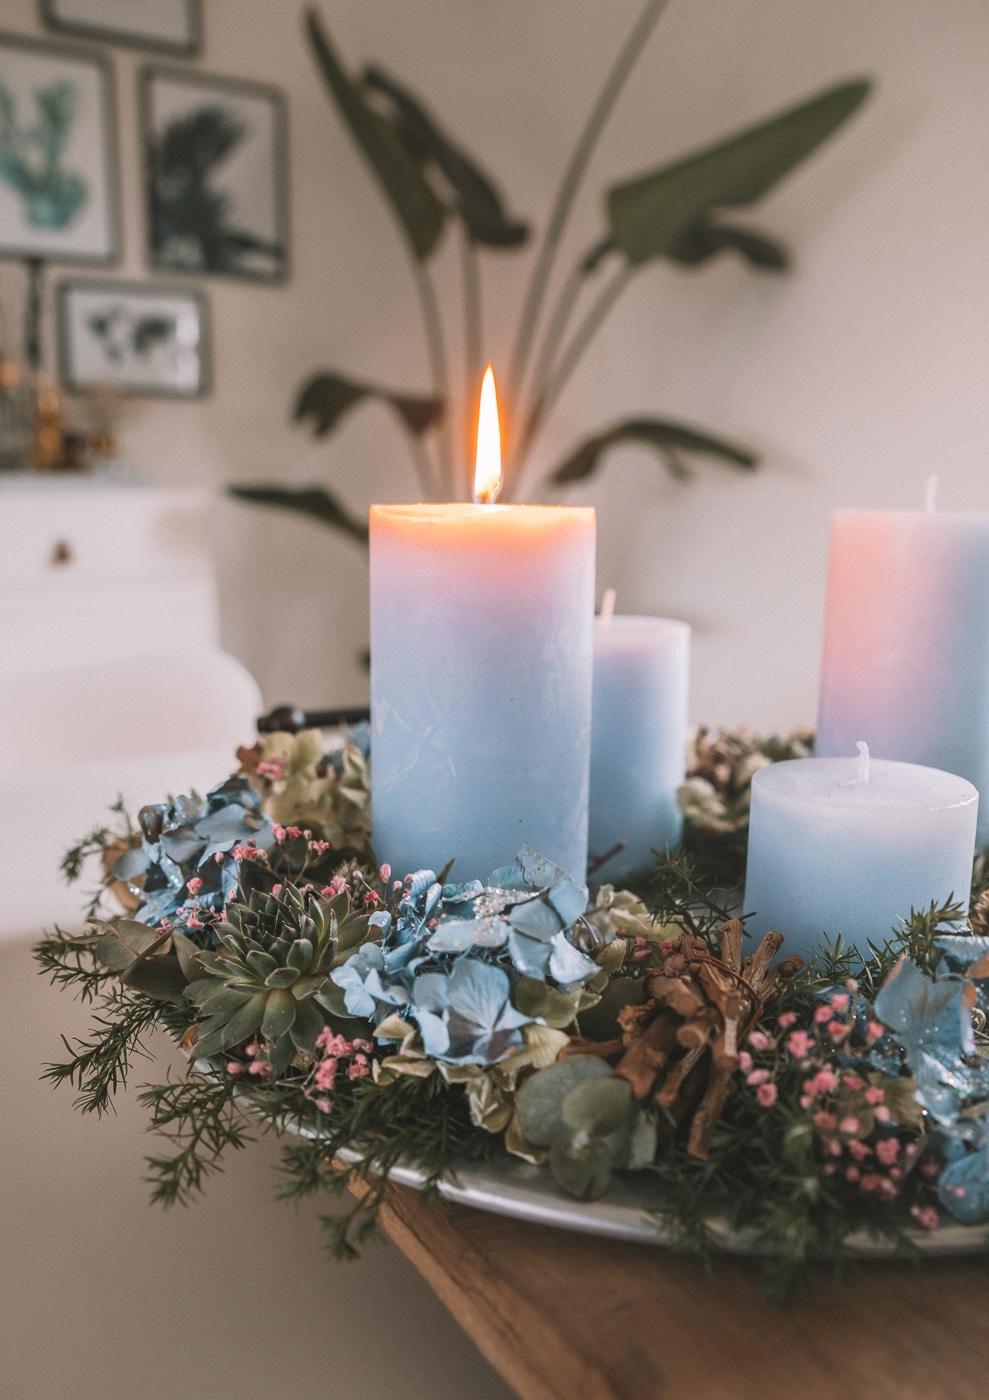 inspiration til adventskrans, jul, julepynt